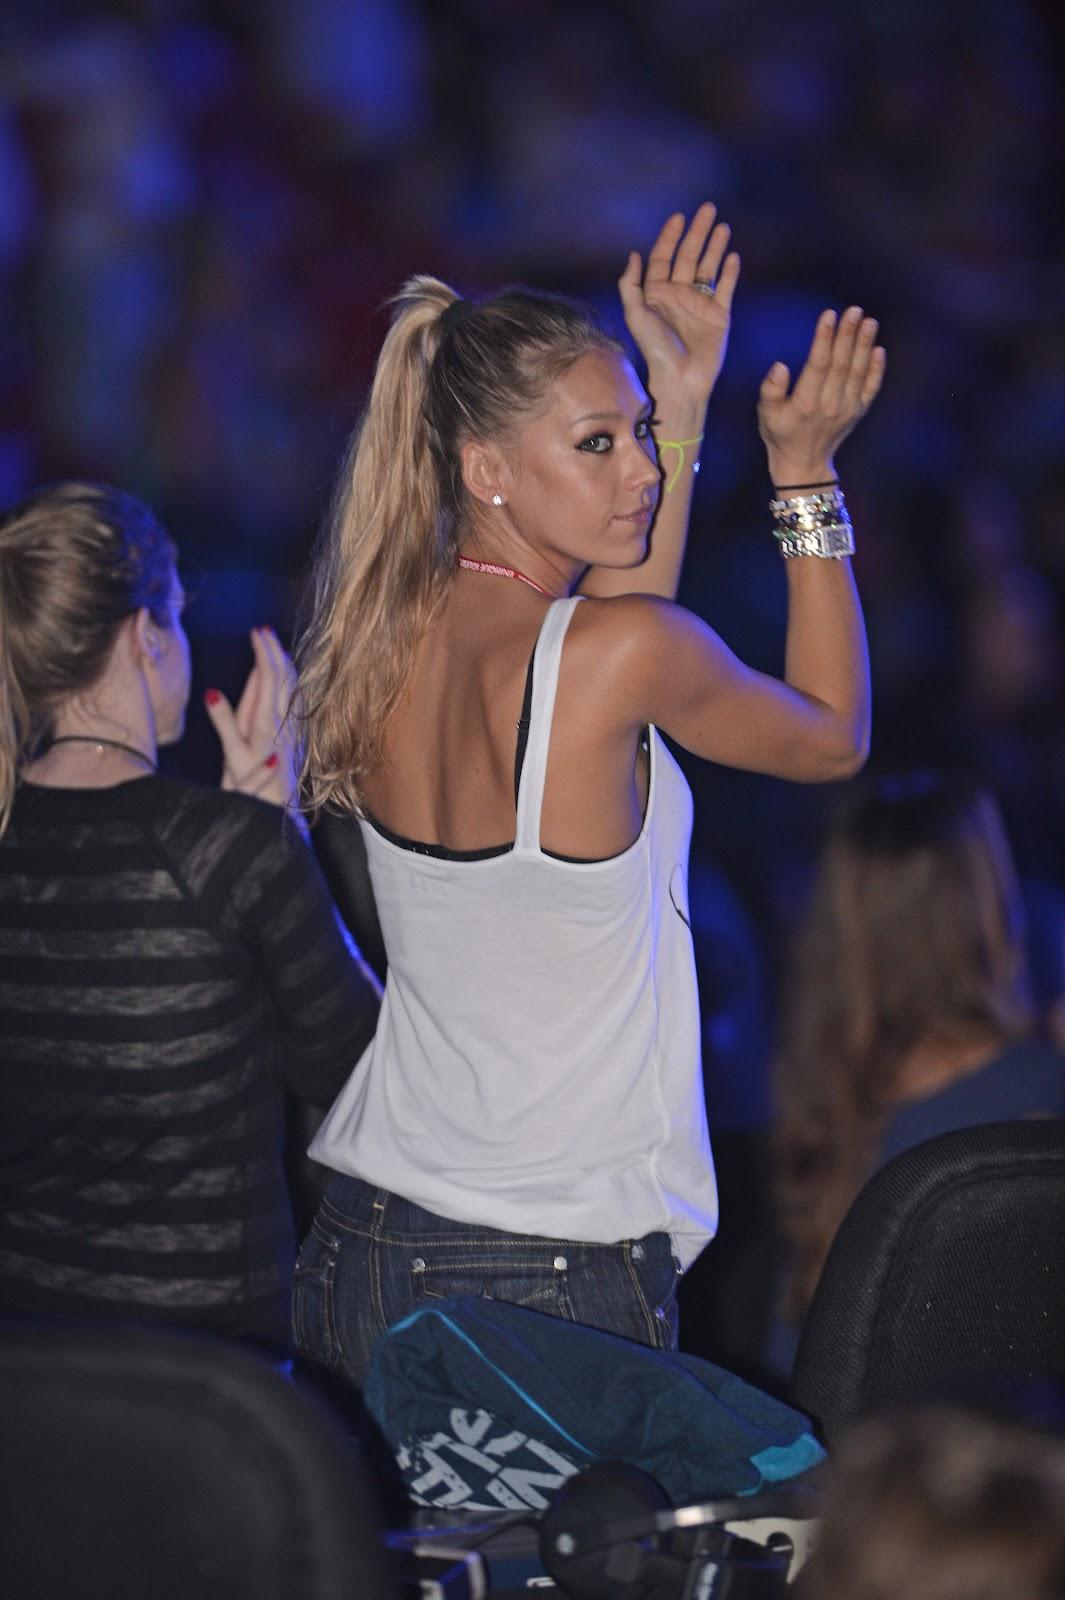 http://2.bp.blogspot.com/-WwvpgFK_XAc/UETSo3uGueI/AAAAAAAAcag/hDrCRCZSEy4/s1600/Anna+Kournikova+Ass+Shot+in+Jeans+at+Enrique+Iglesias+Concert+in+Miami+-+August+31%252C+2012+2.jpg